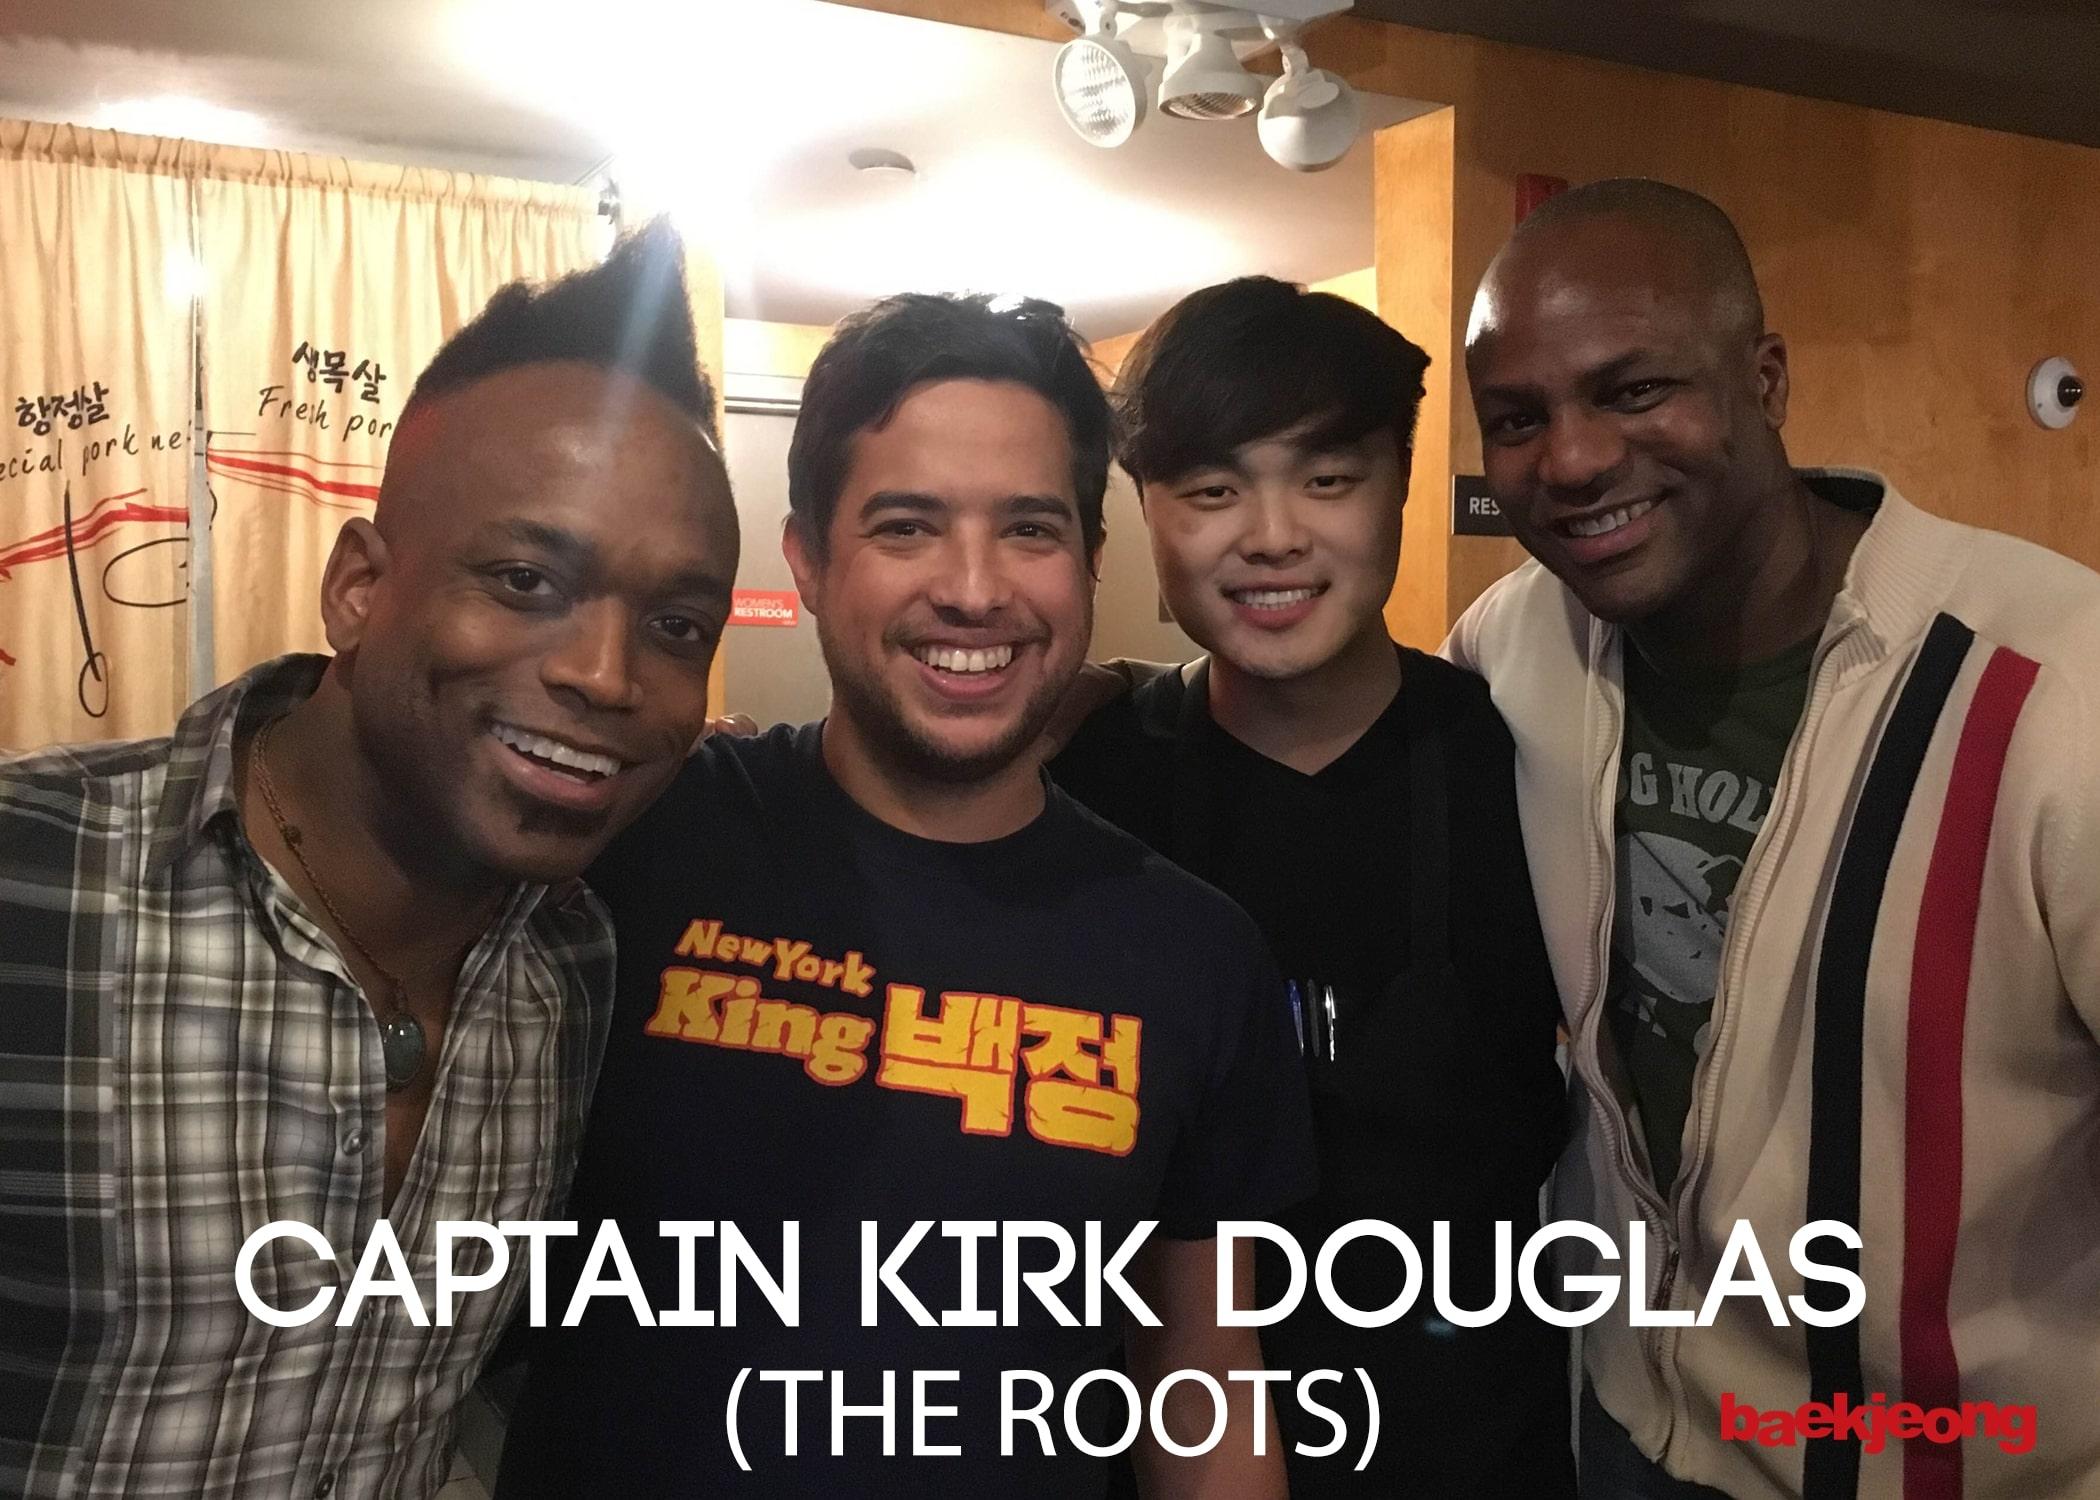 CaptainKirkDouglas.jpg